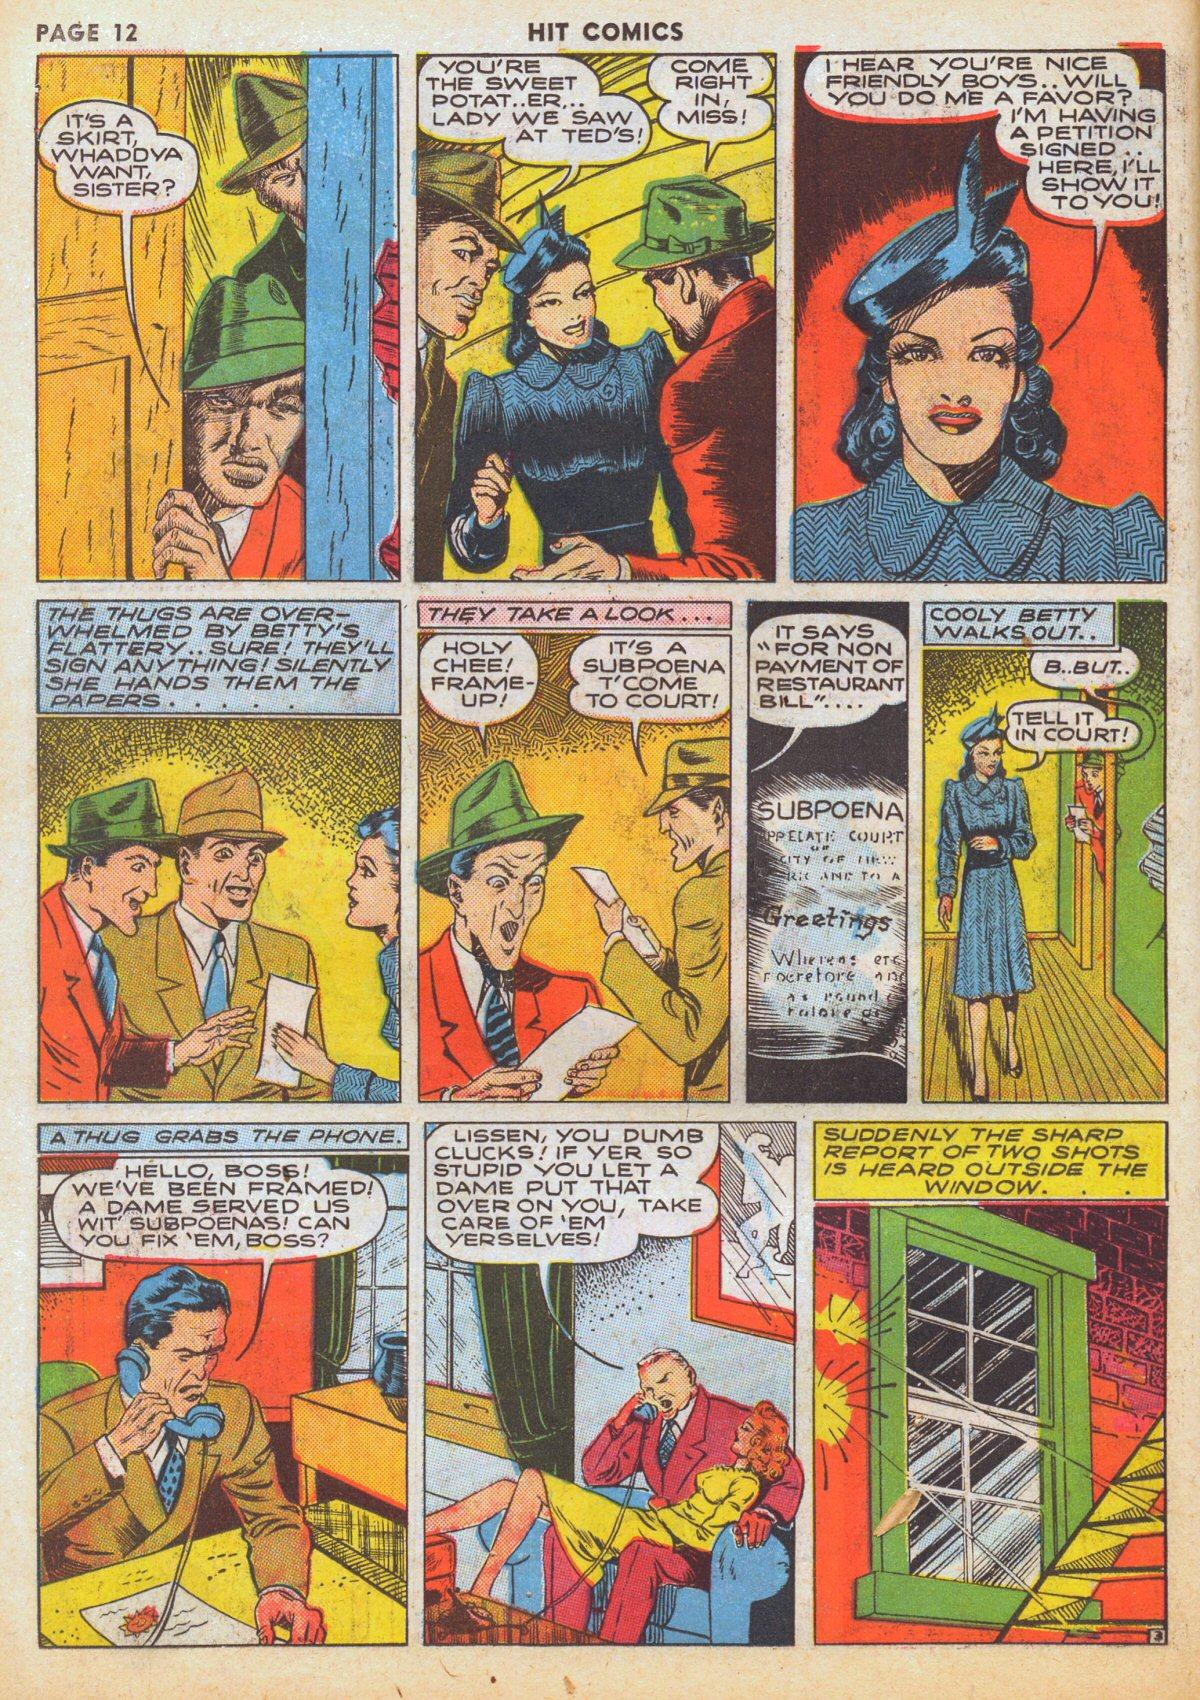 Read online Hit Comics comic -  Issue #12 - 14